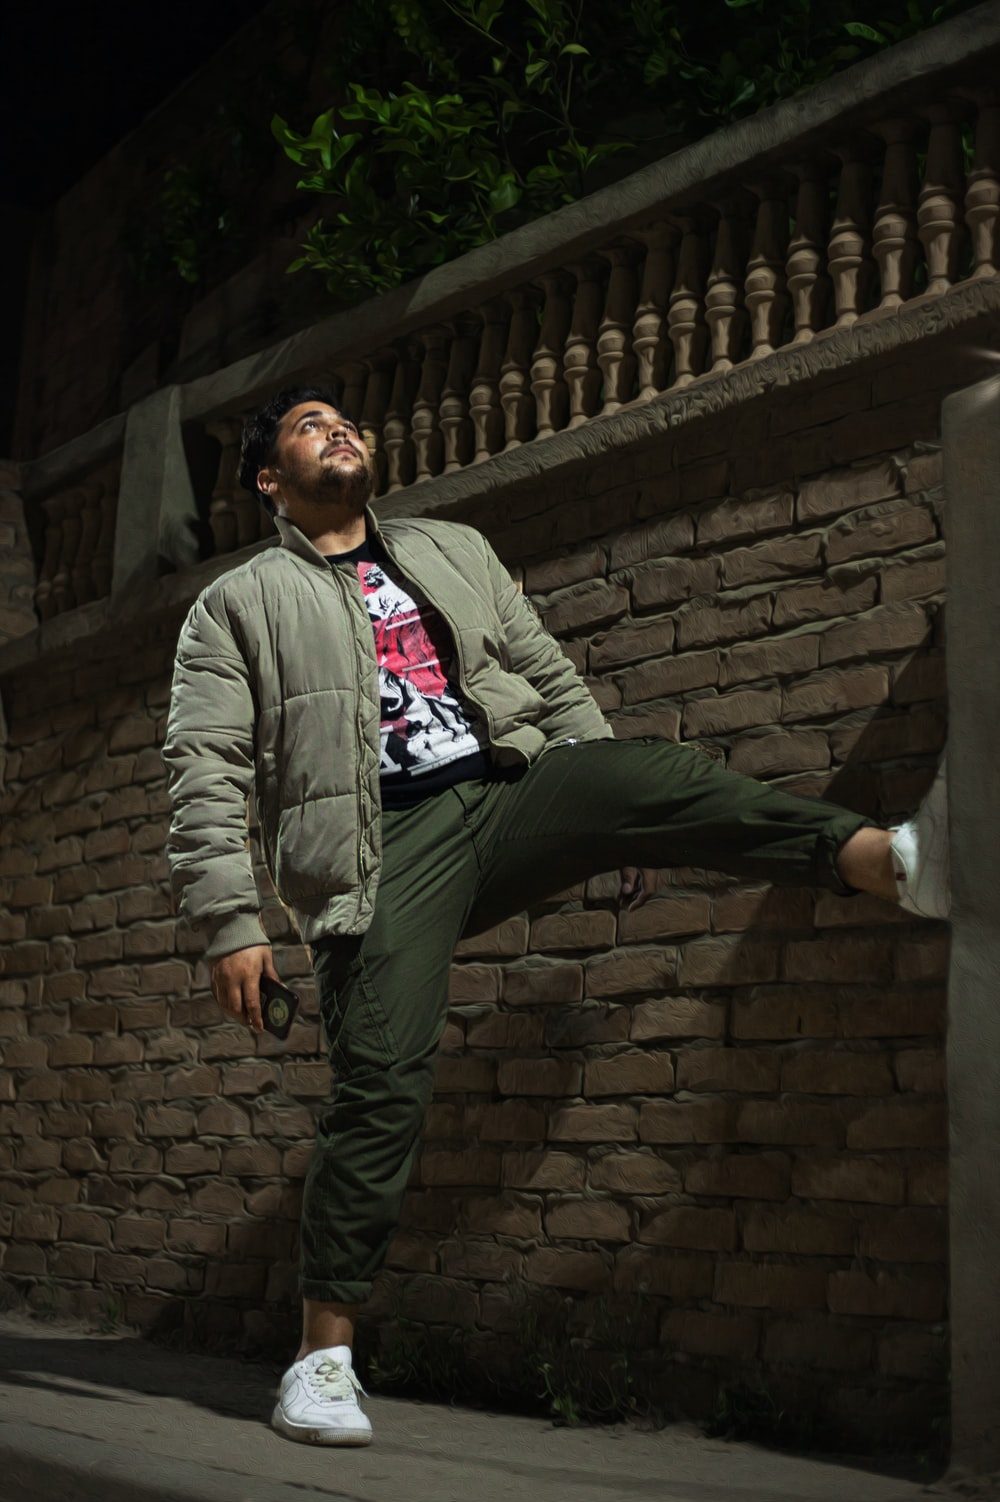 man in gray jacket standing beside brick wall